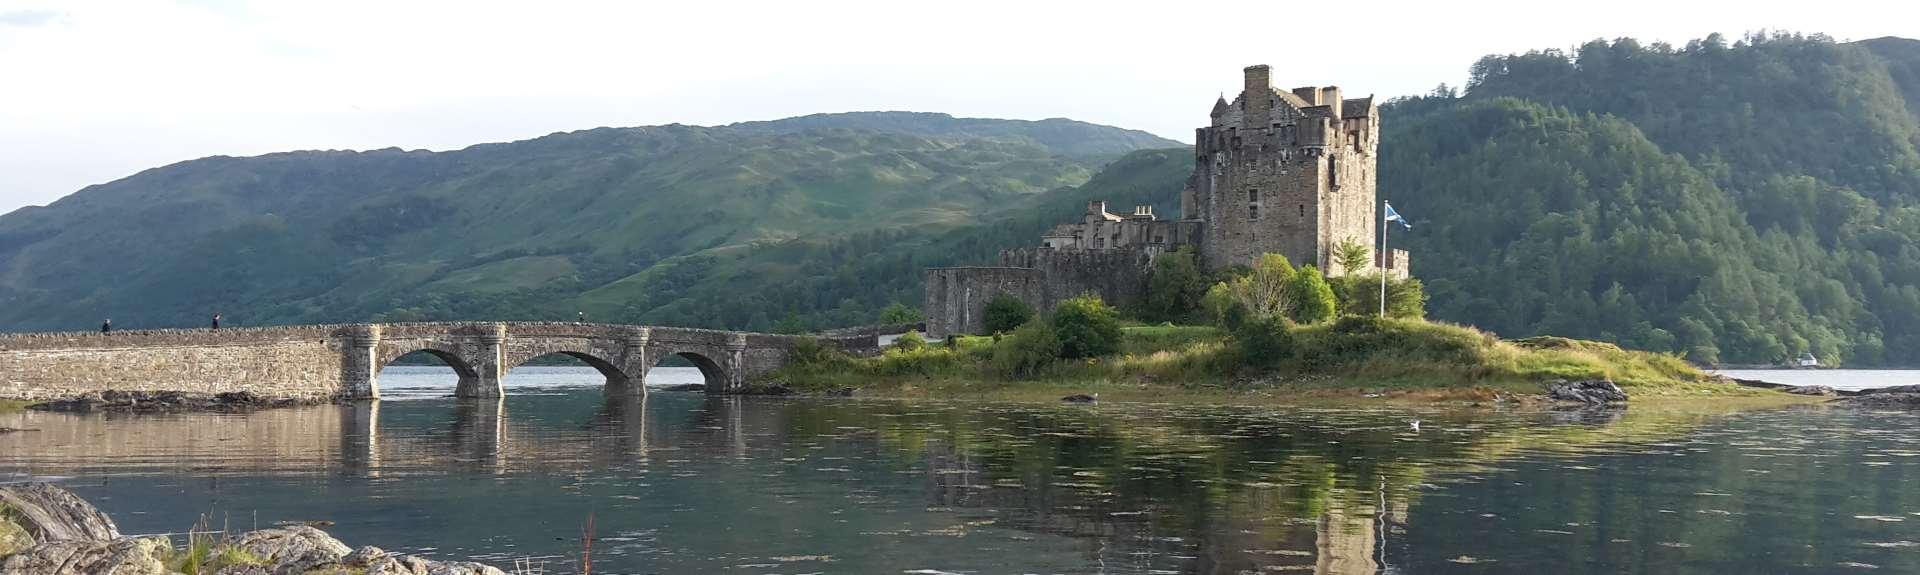 a river bridge and castle picture